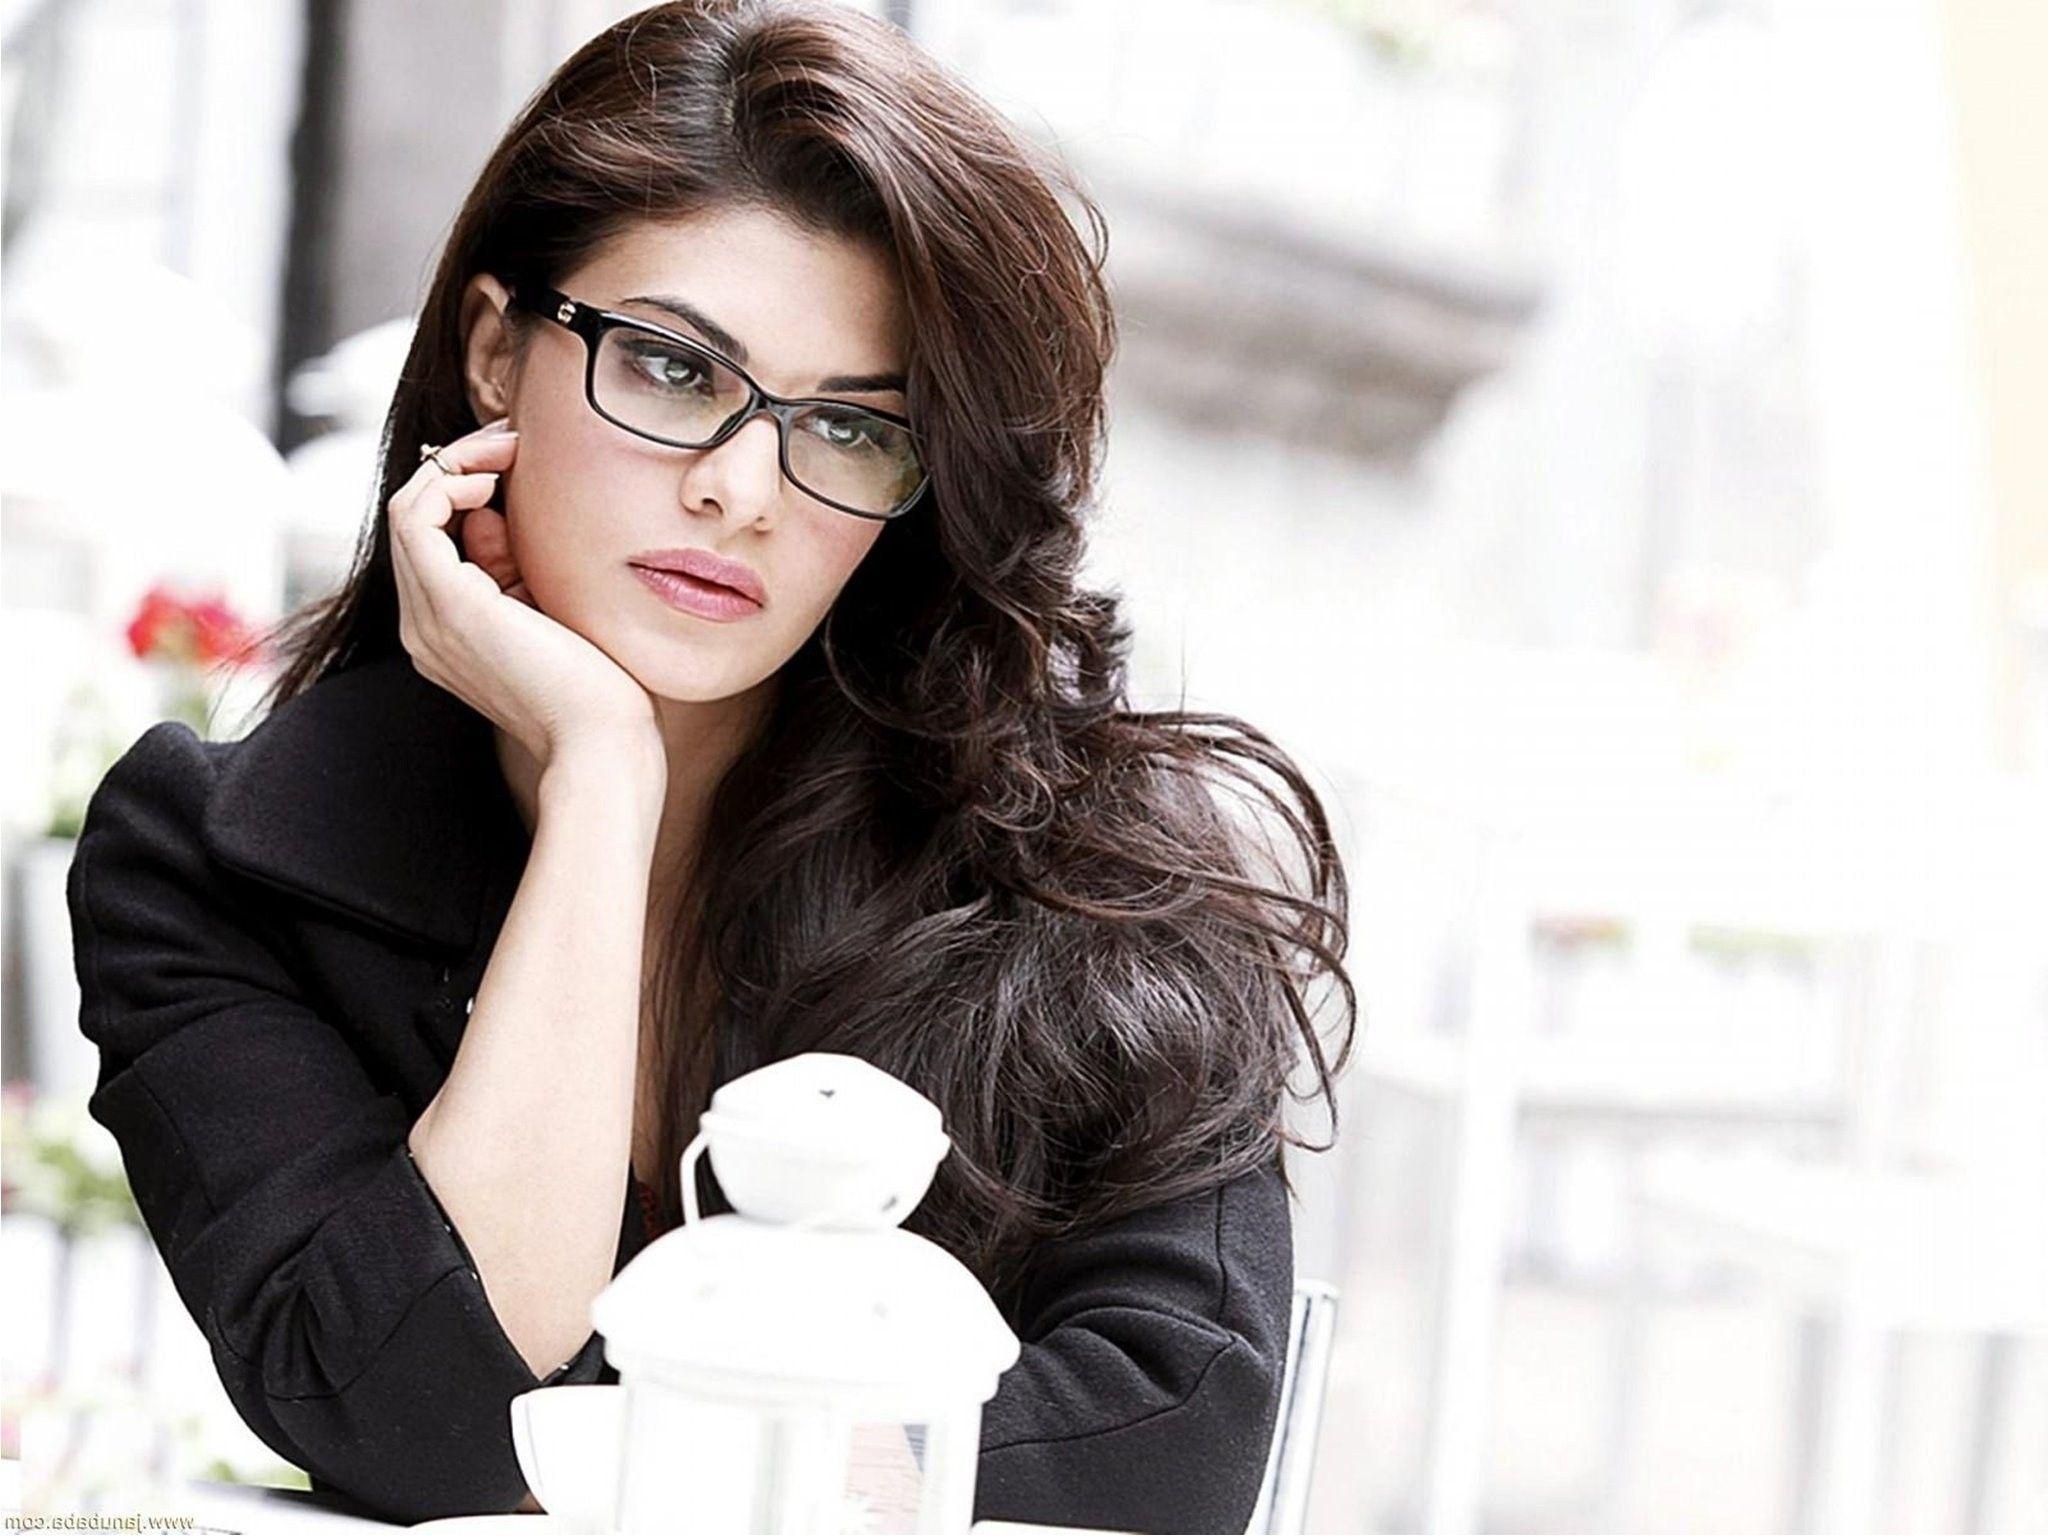 jacqueline fernandez hd photos movie celebrity actress wallpaper